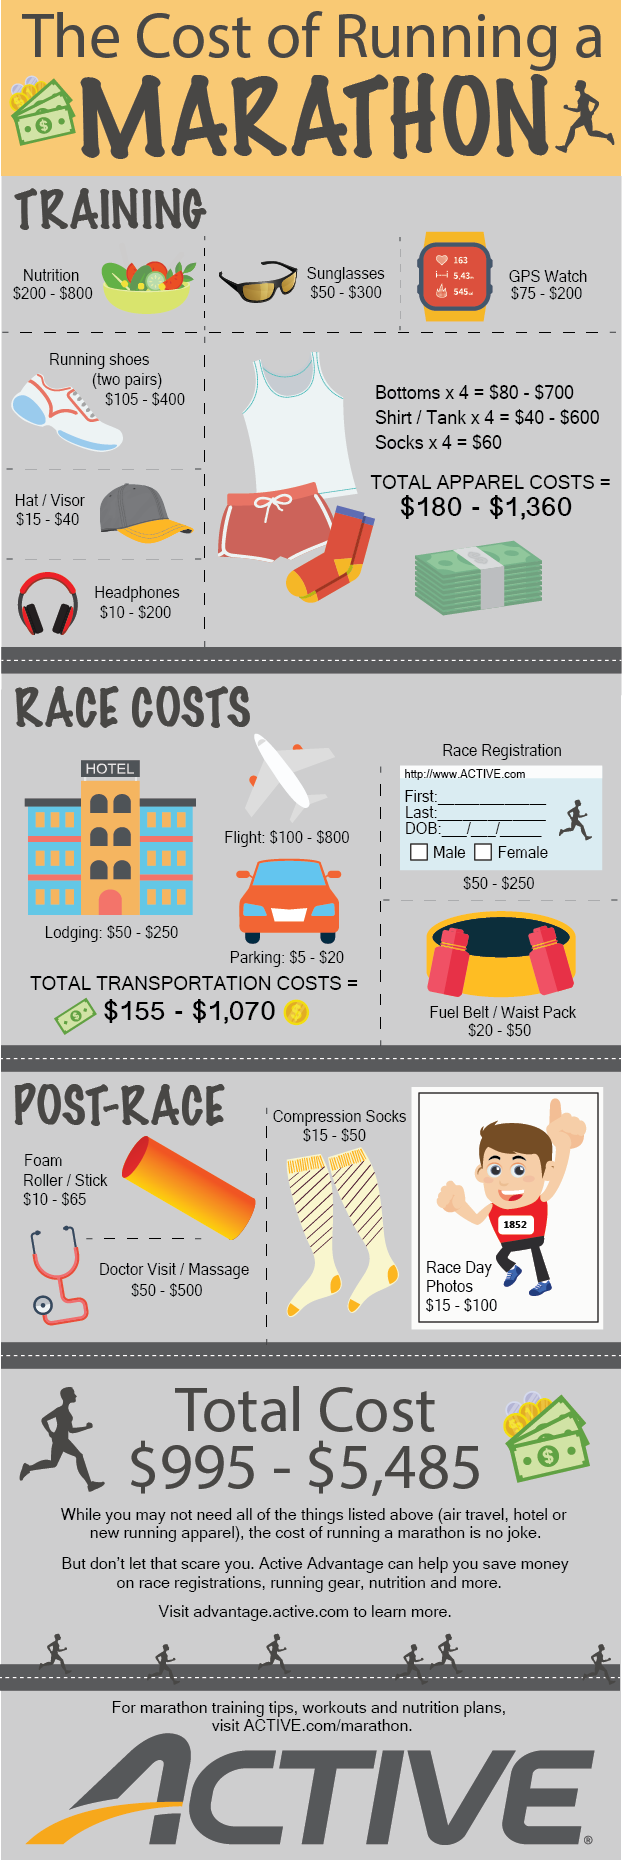 The Cost of Running a Marathon